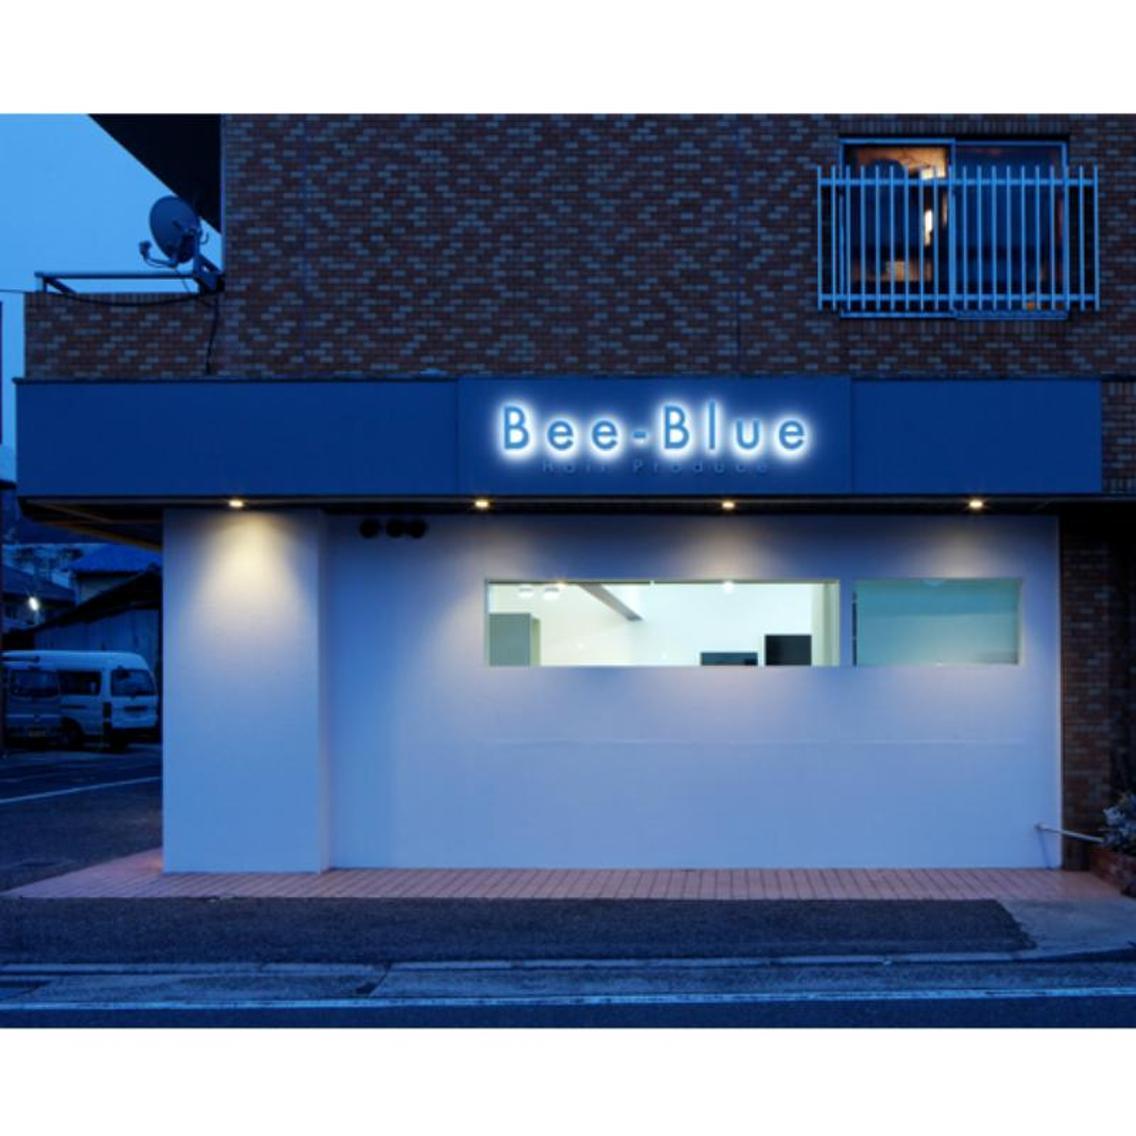 Bee-Blue Hair Produce所属・Bee-Blue HairProduceの掲載